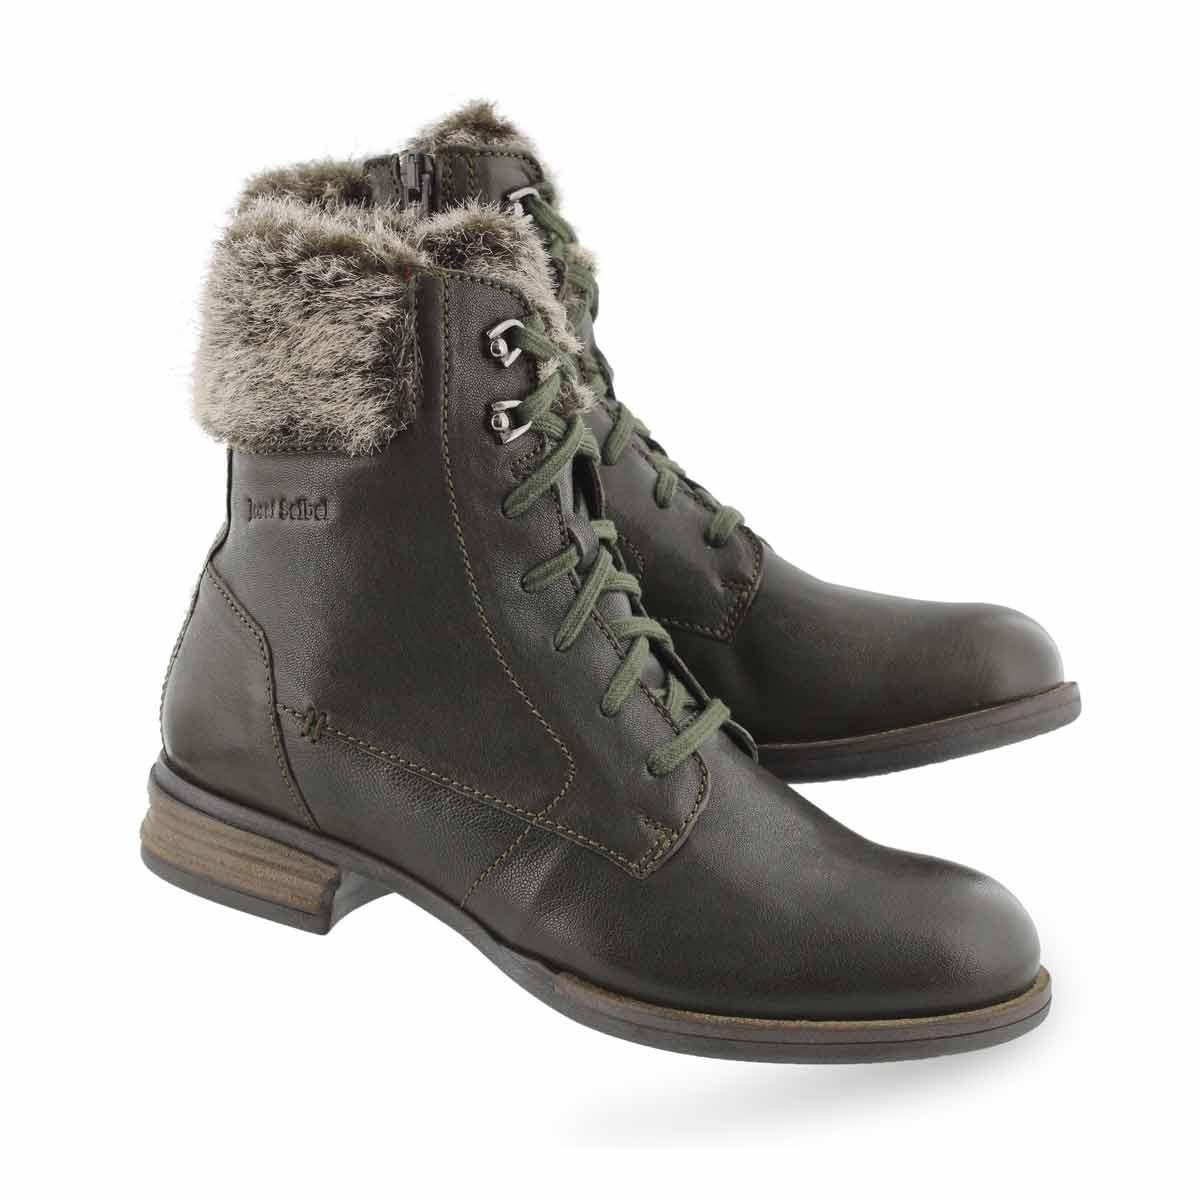 Lds Sanja 03 olive combat boot